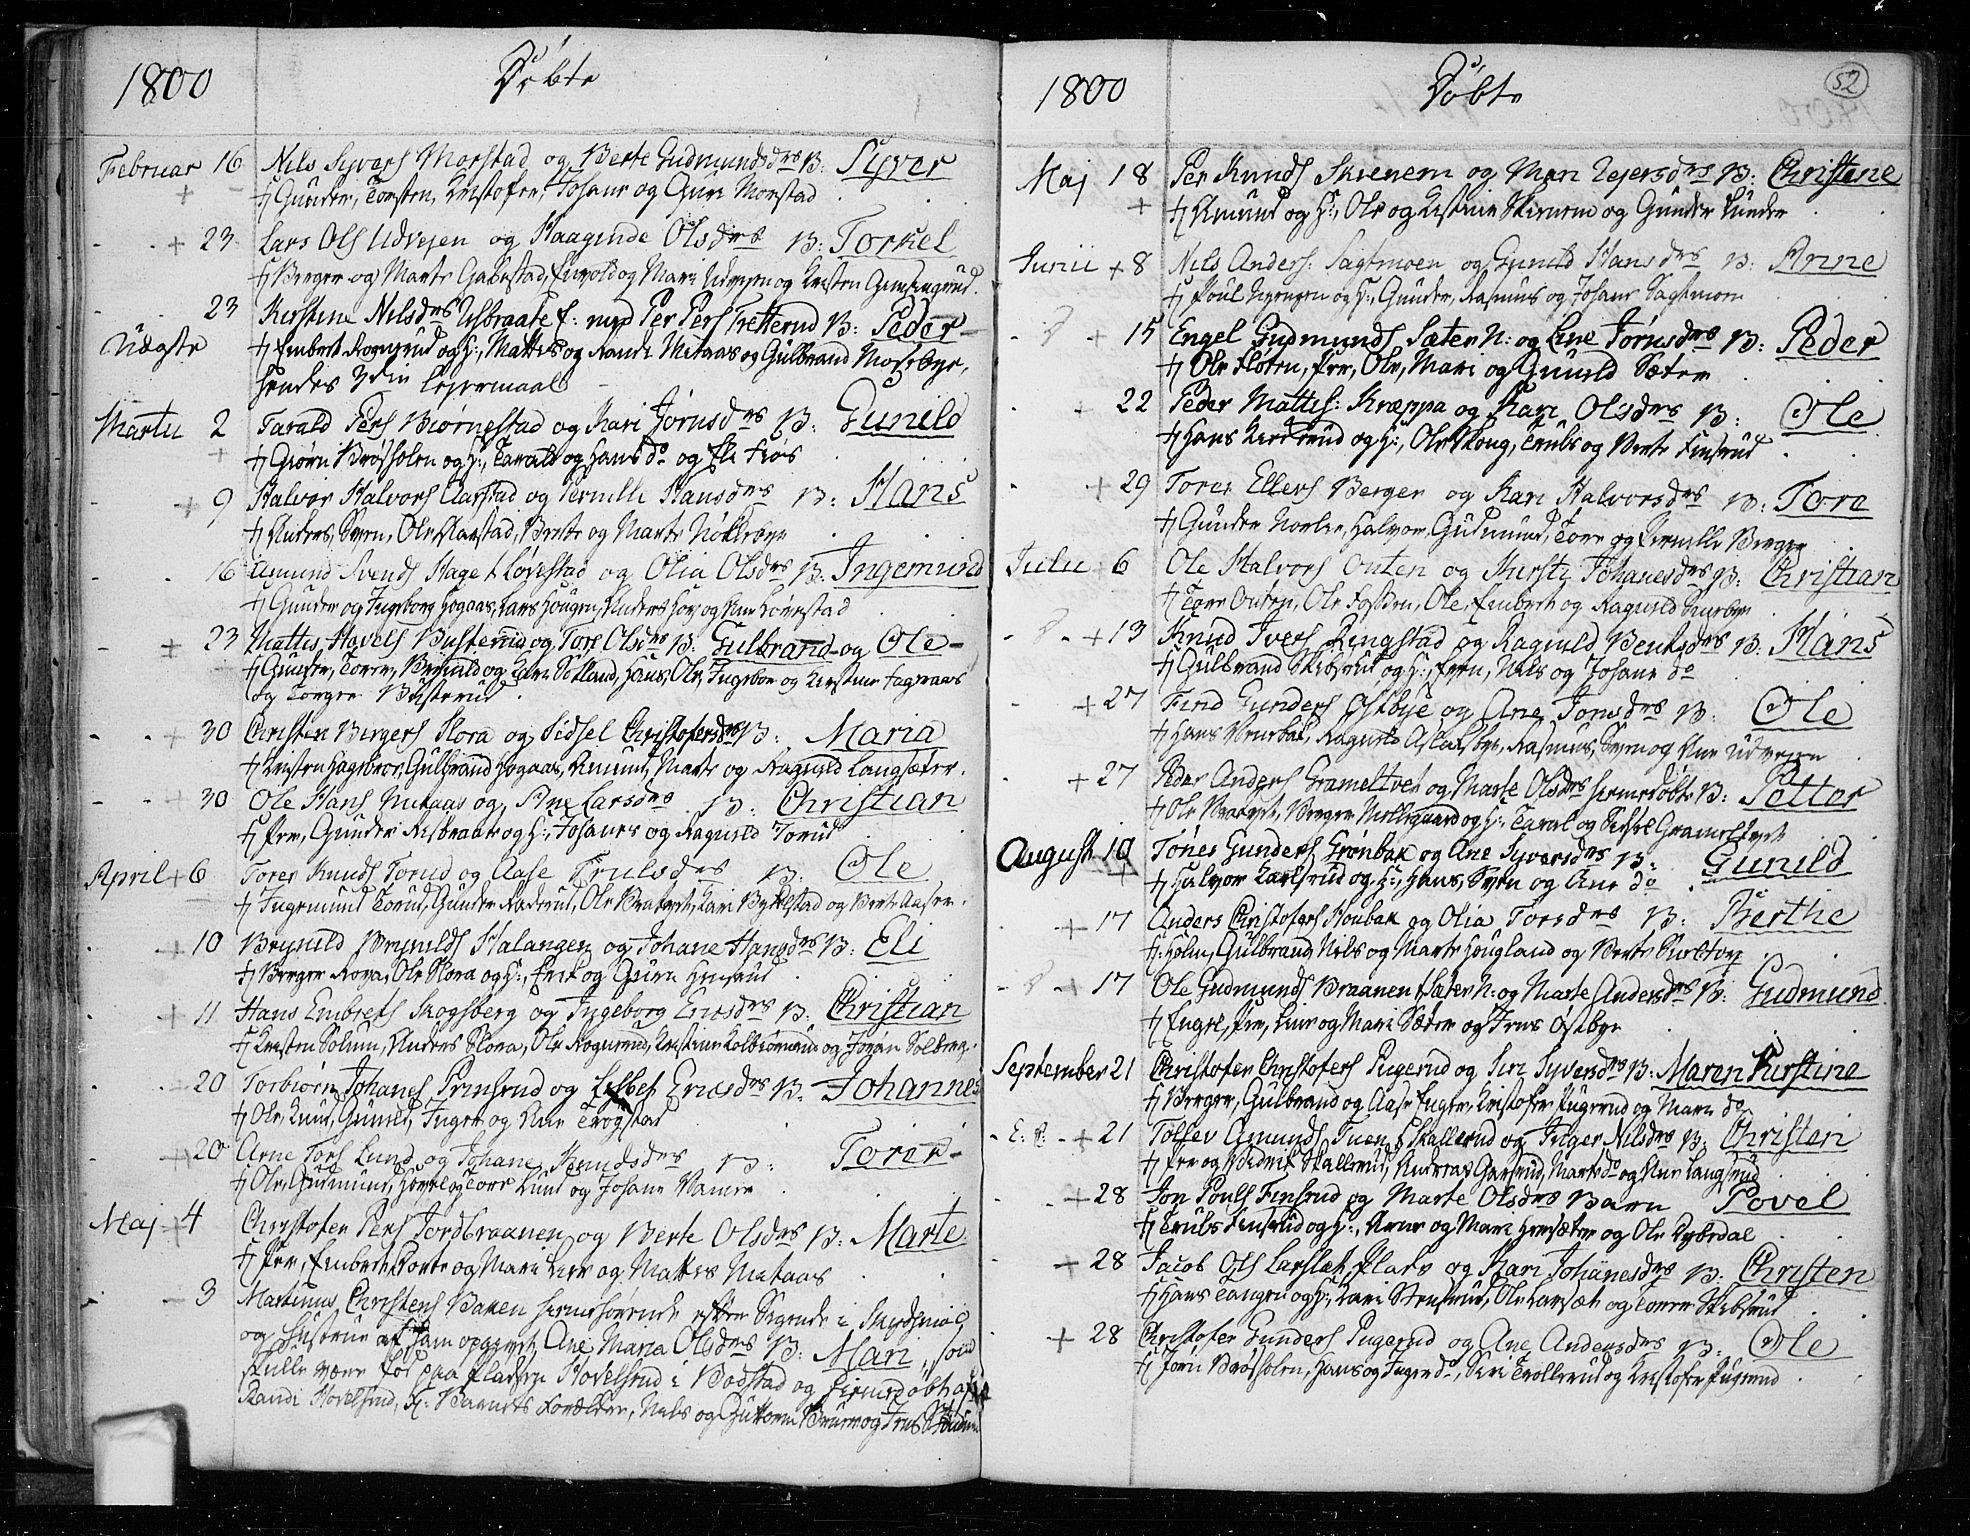 SAO, Trøgstad prestekontor Kirkebøker, F/Fa/L0005: Ministerialbok nr. I 5, 1784-1814, s. 52